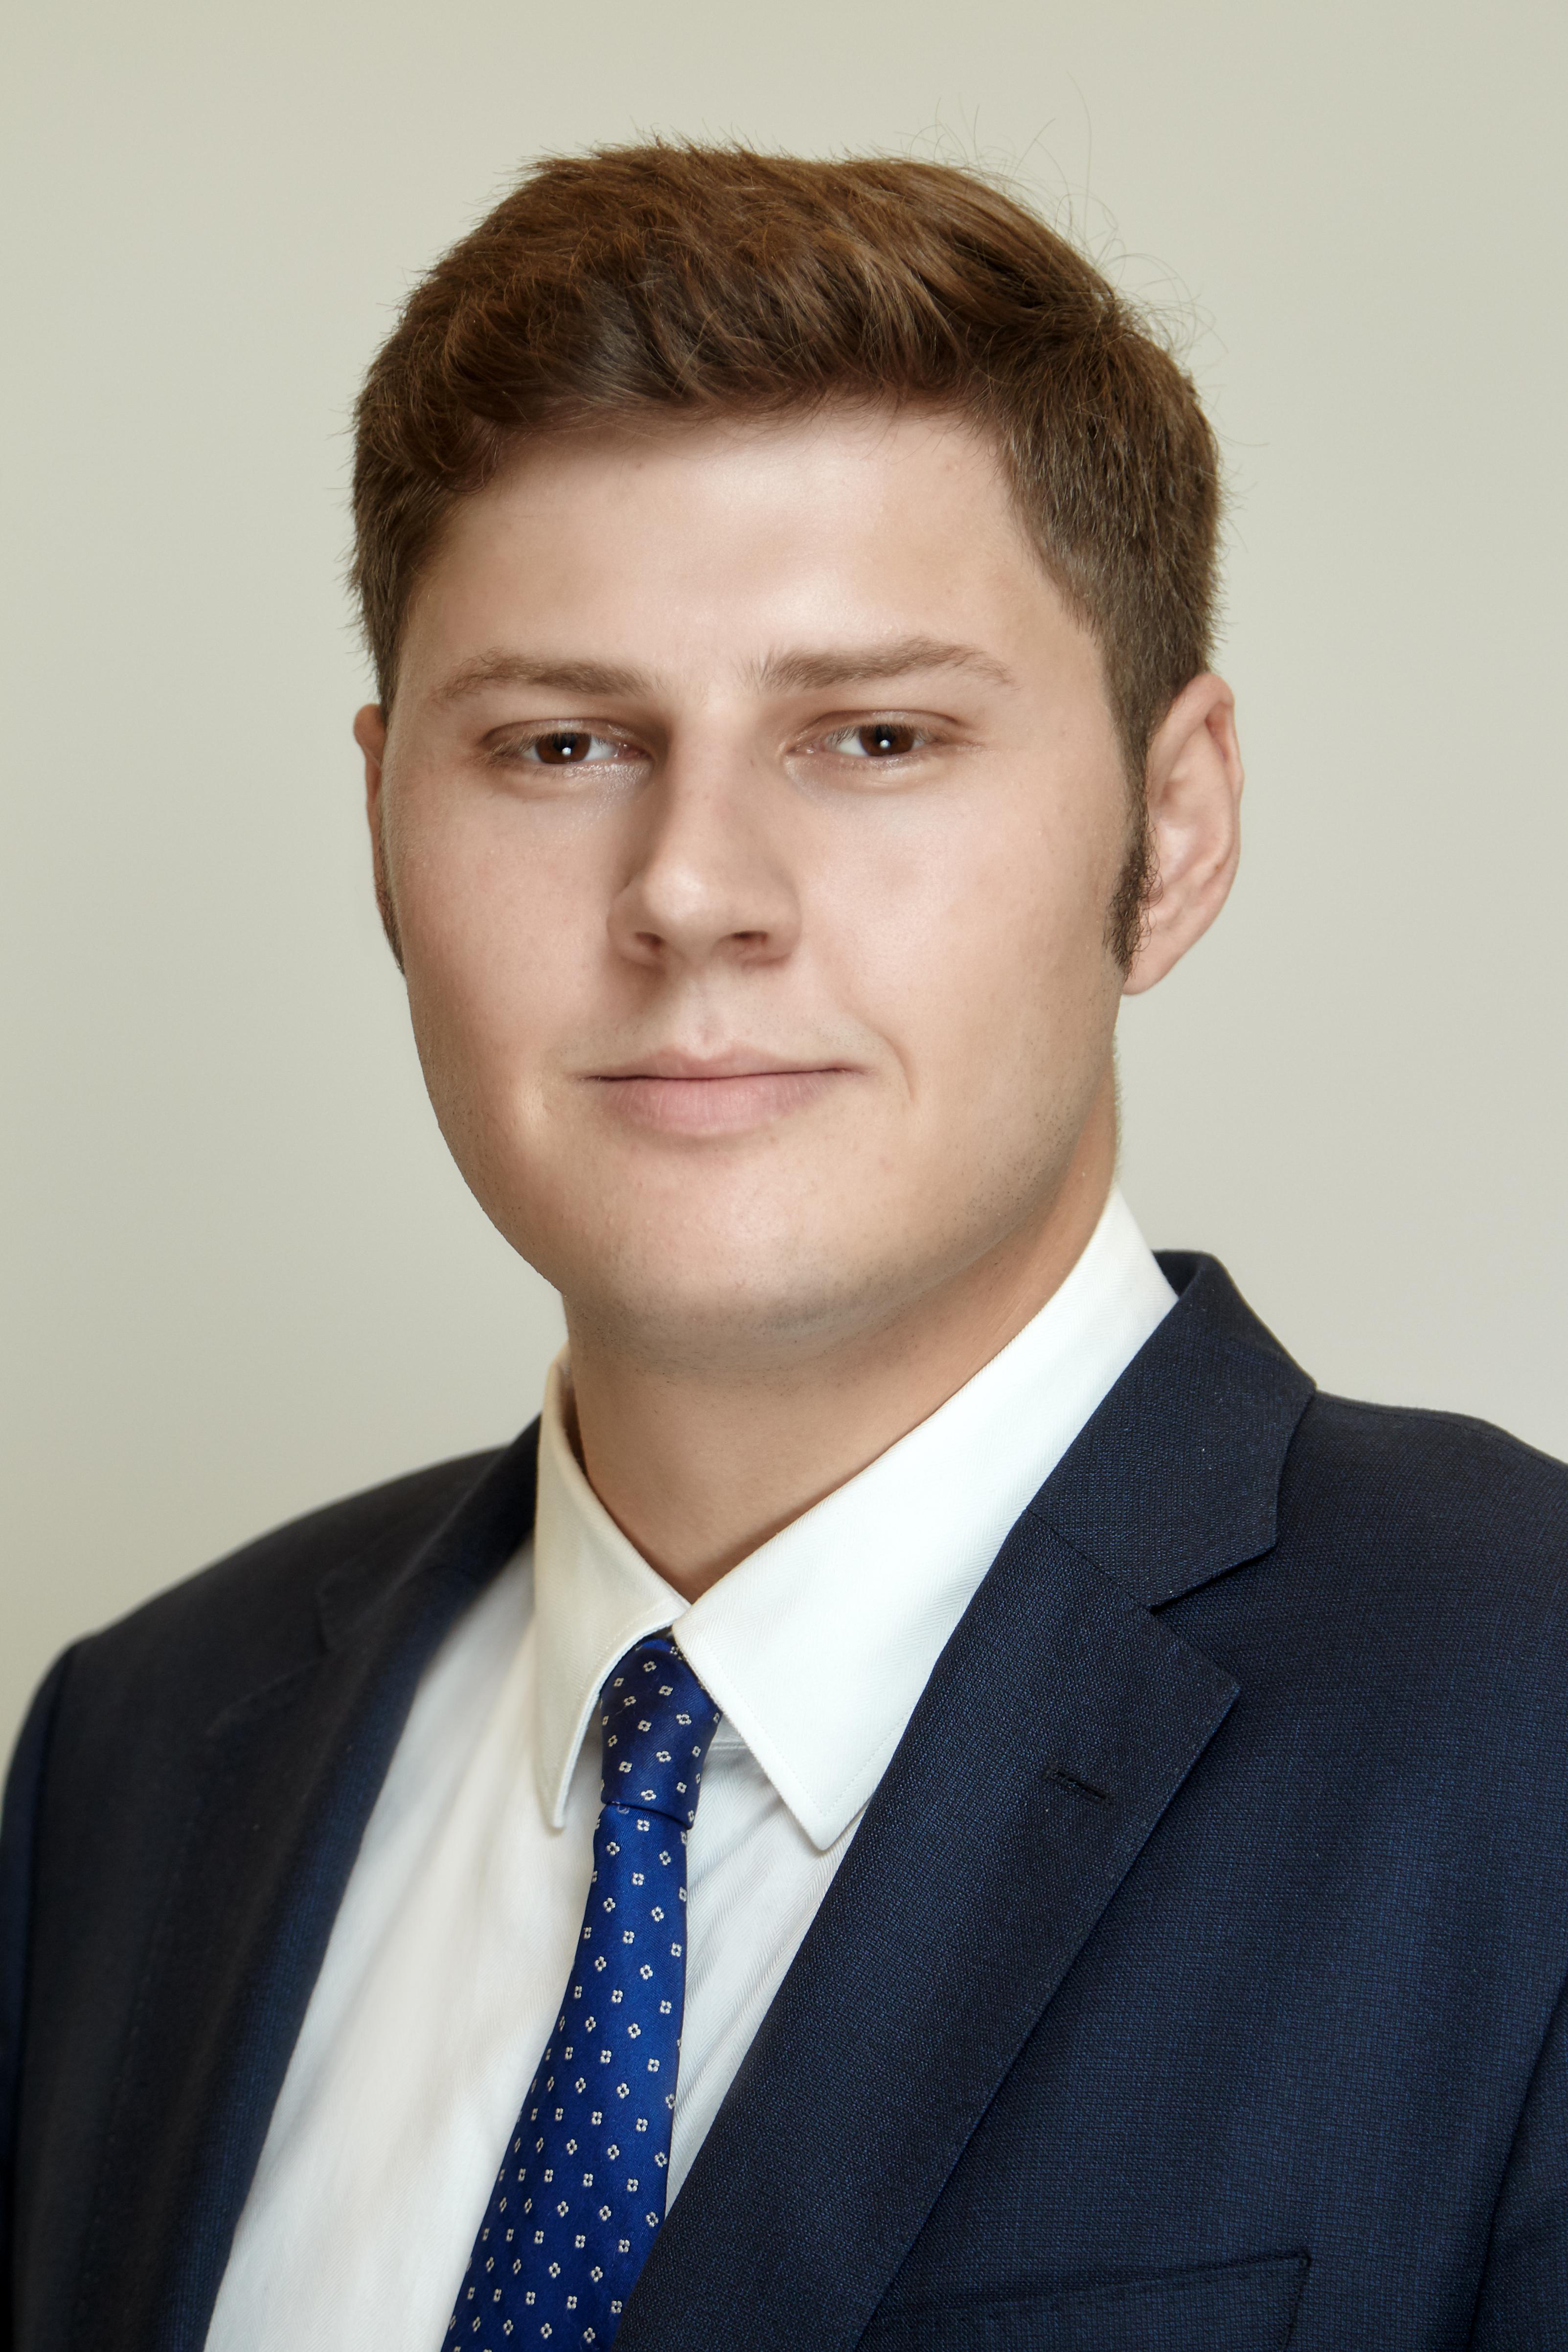 Ilya Ukraine gamb law